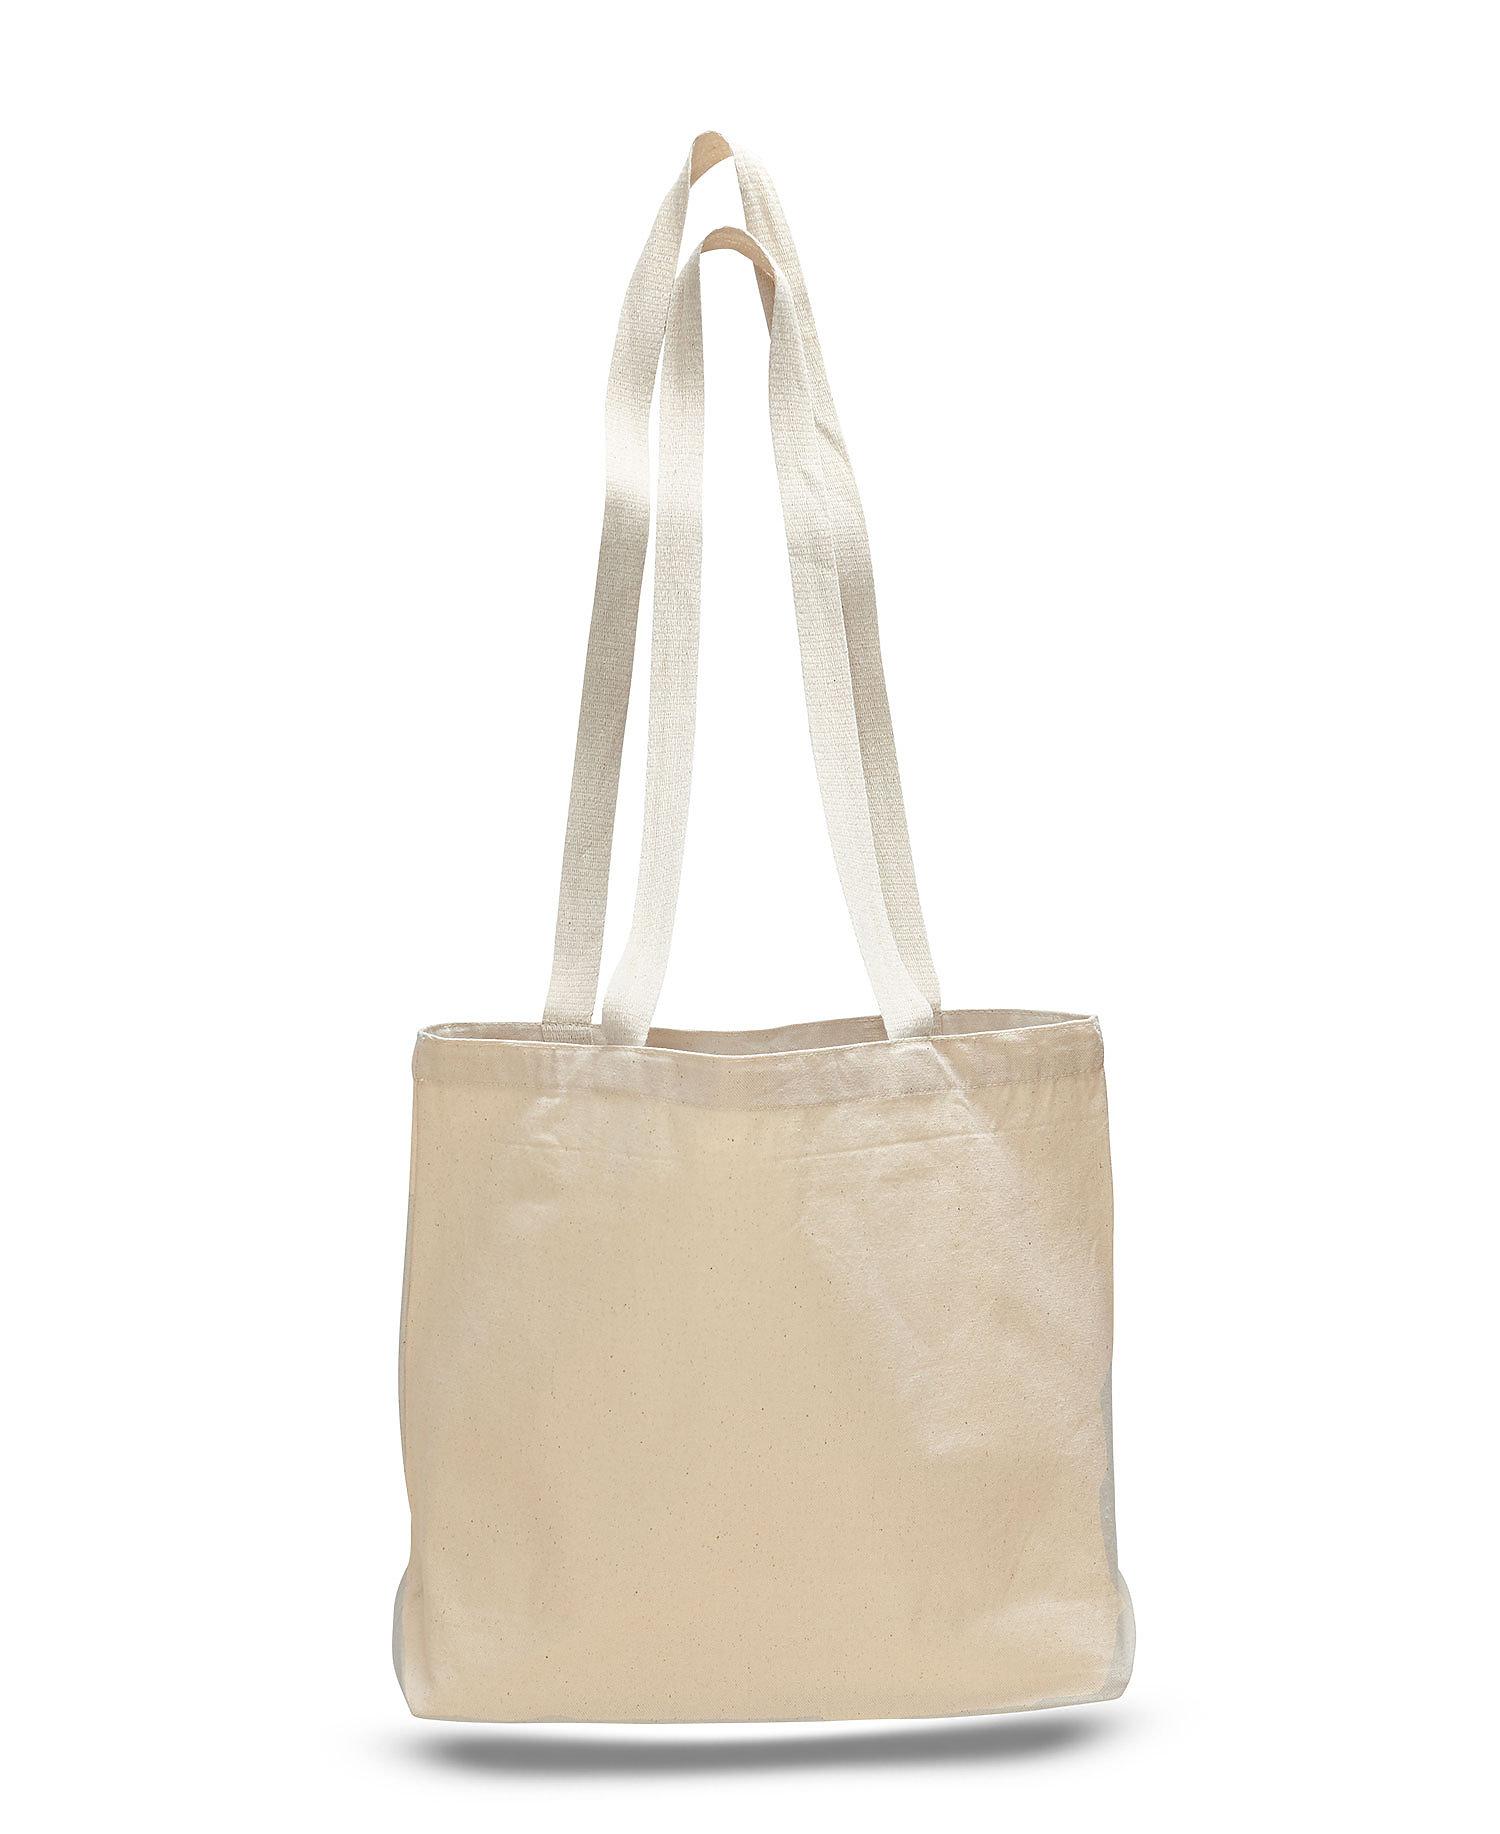 Q-Tees Q126200 - Large Messenger Bag